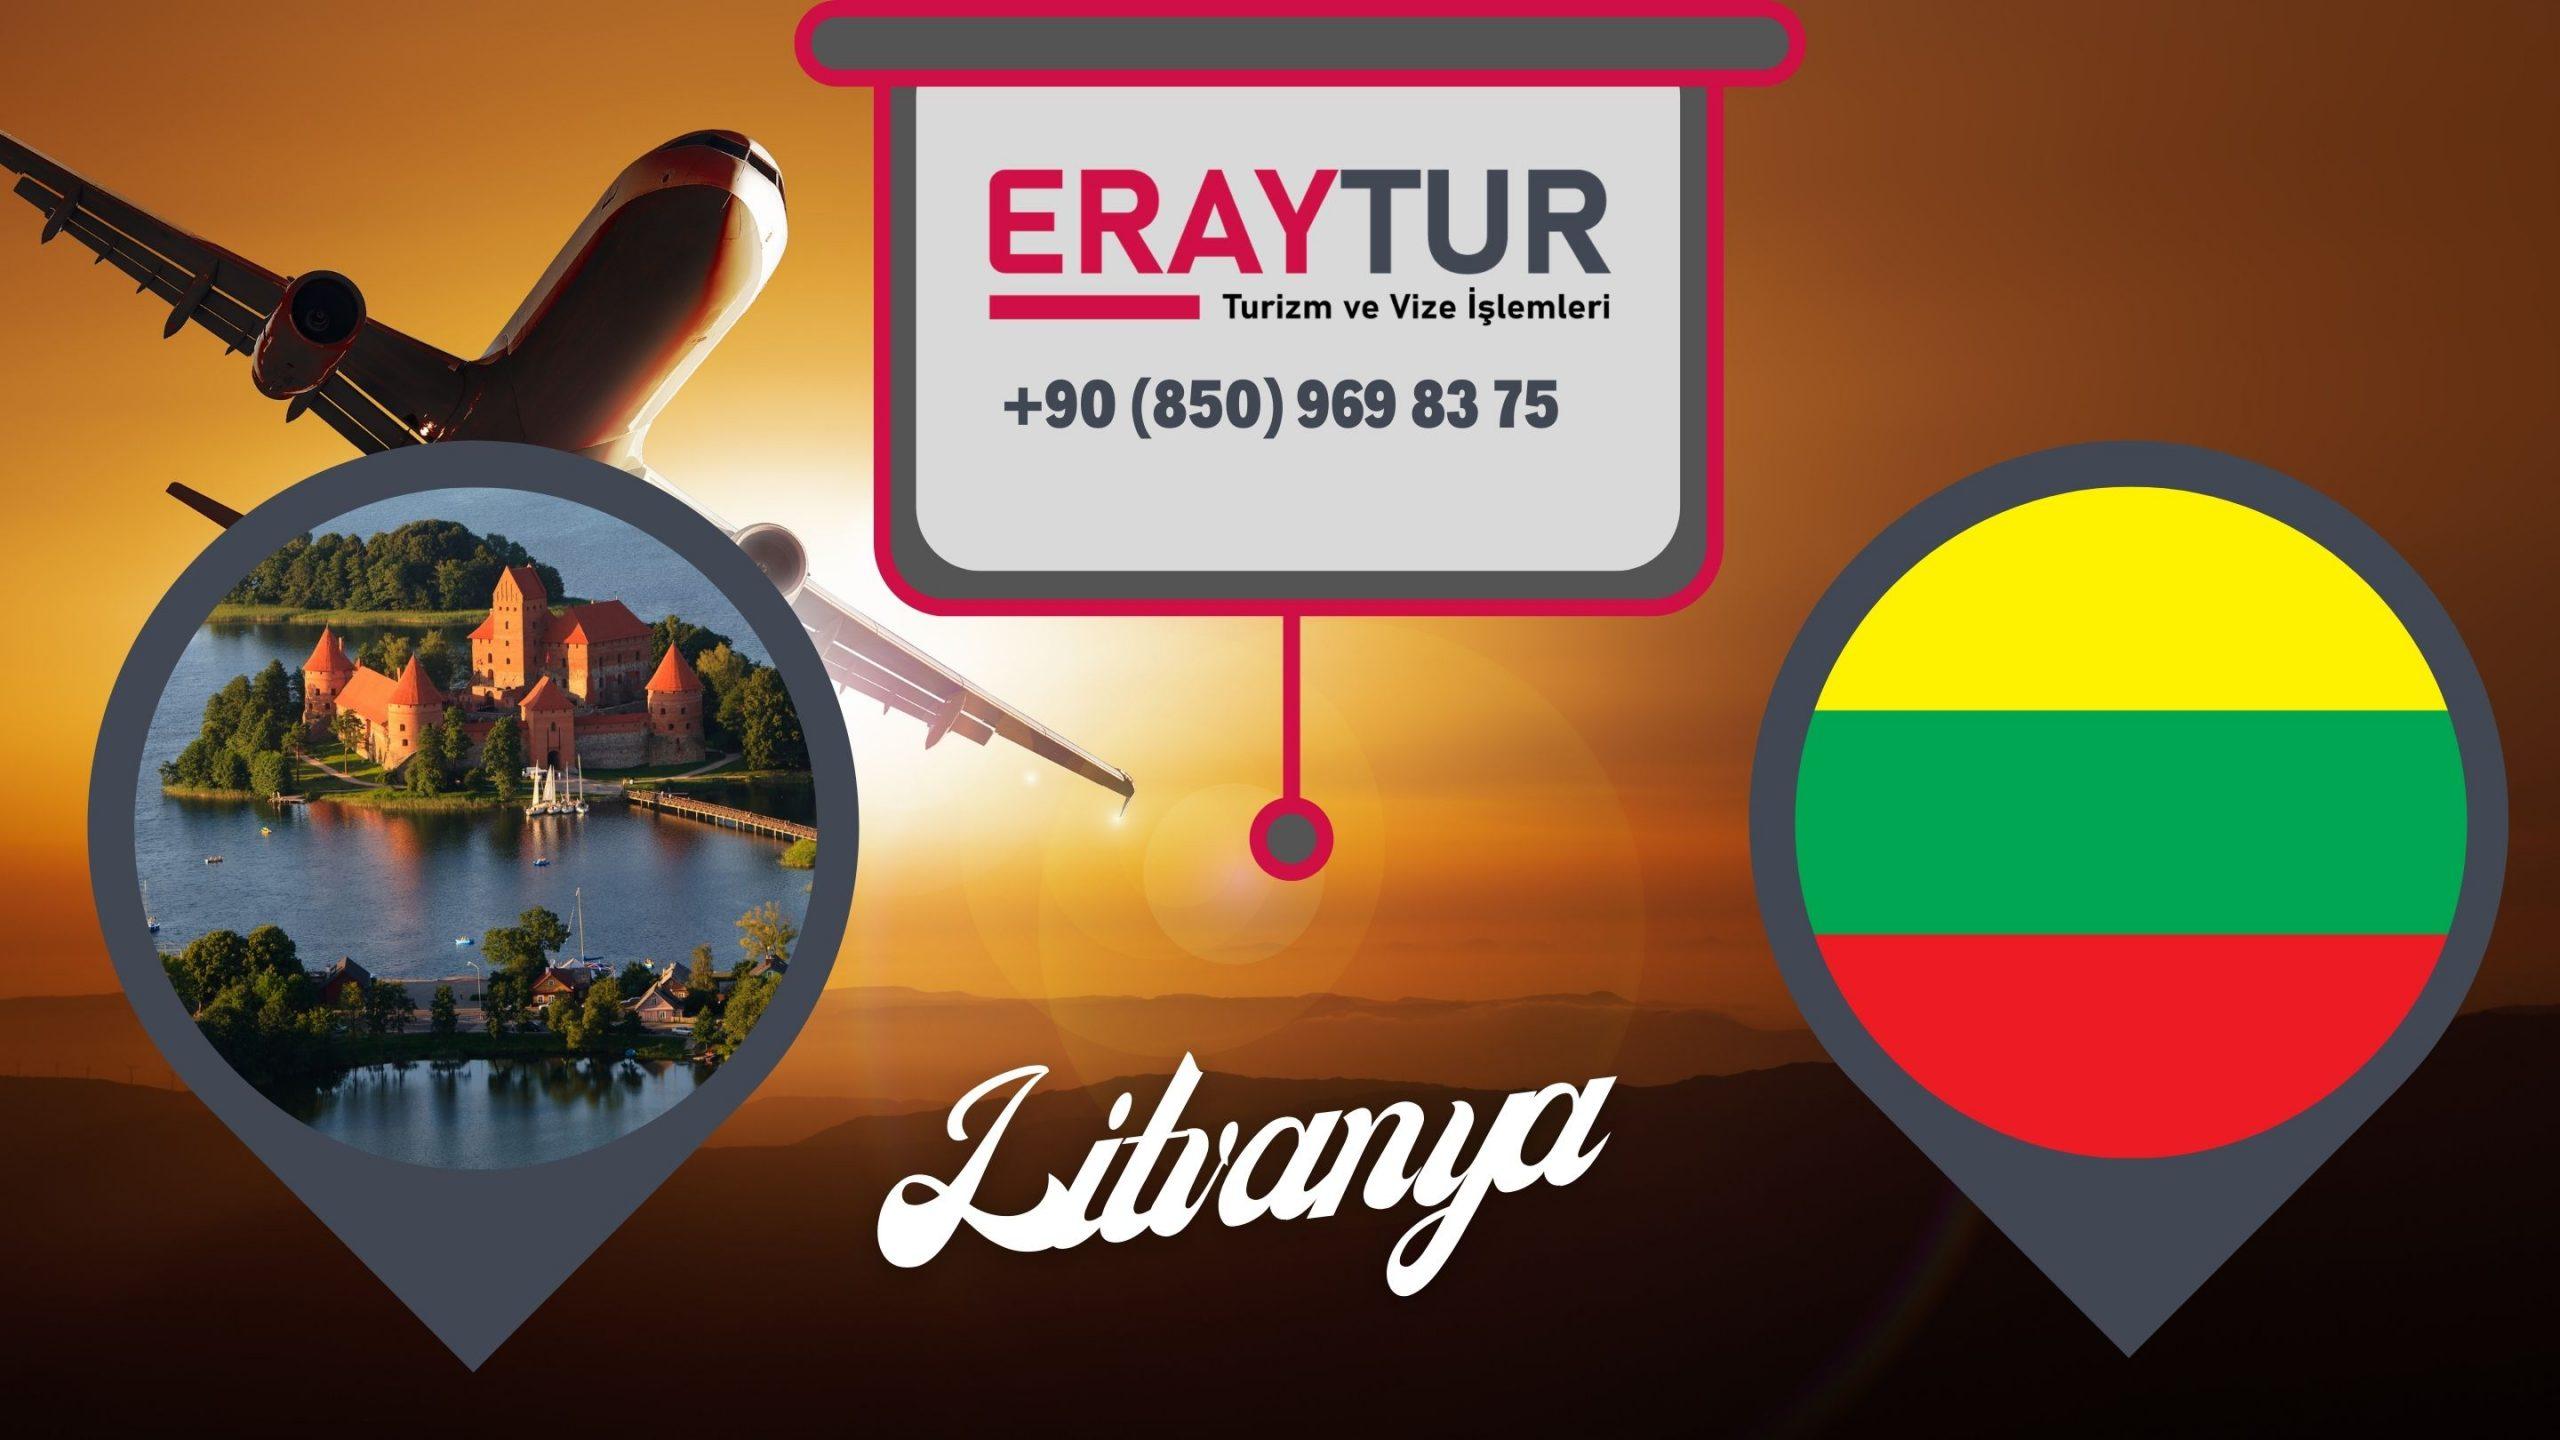 Litvanya Vize Formu ve Dilekçe